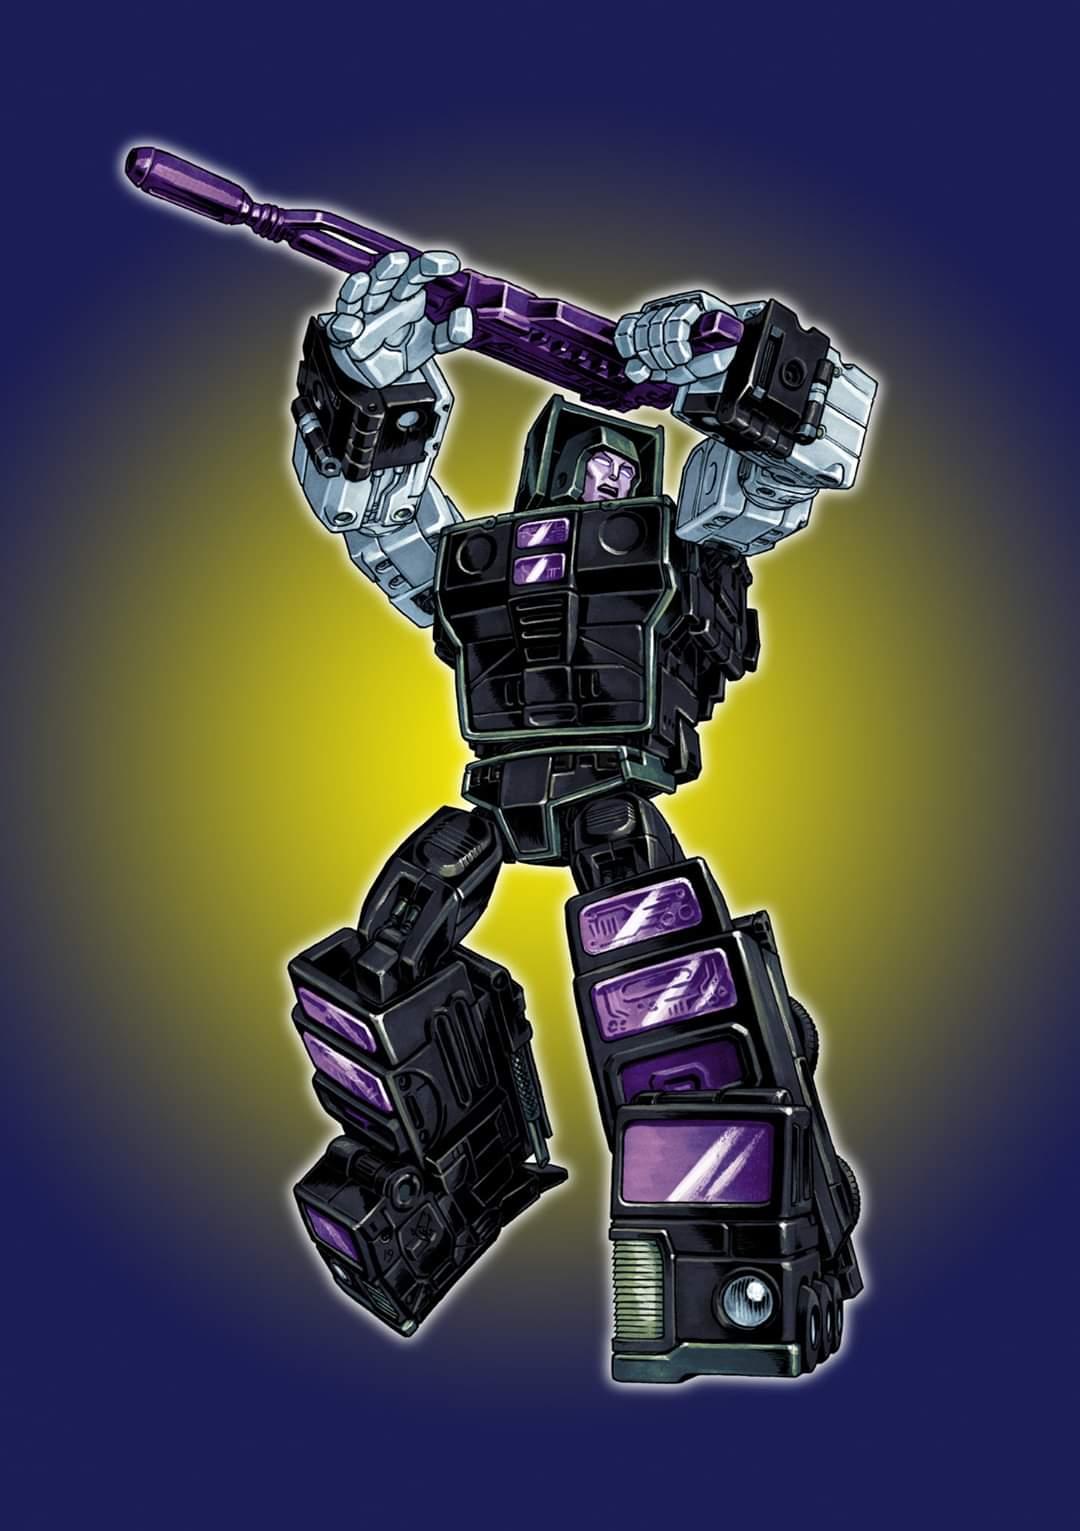 [X-Transbots] Produit Tiers - Jouets Berserkars forme Monolith (MX-XIII à MX-VII) - aka Stunticons forme Menasor/Menaseur - Page 6 V8MwX3Ui_o